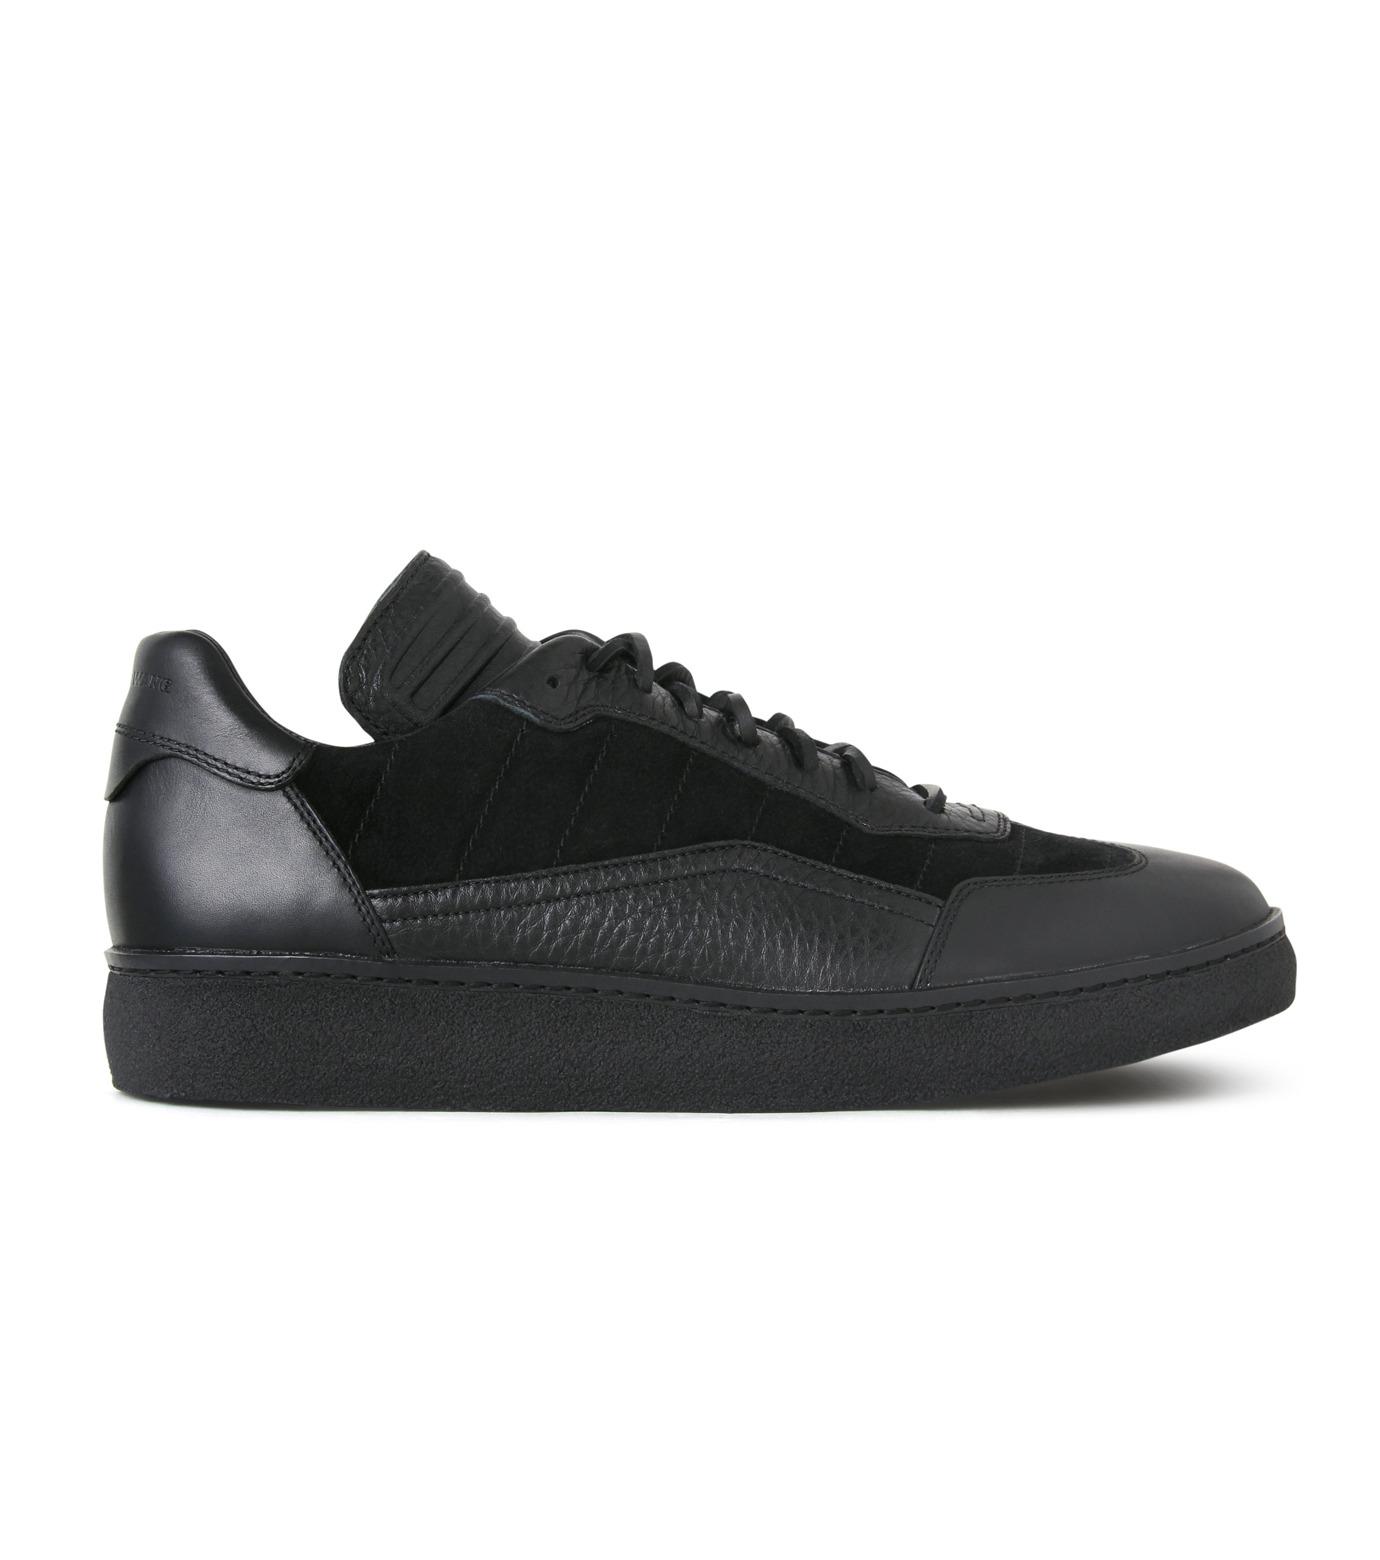 Alexander Wang(アレキサンダーワン)のEden Low-BLACK(シューズ/shoes)-311103S16-13 拡大詳細画像1